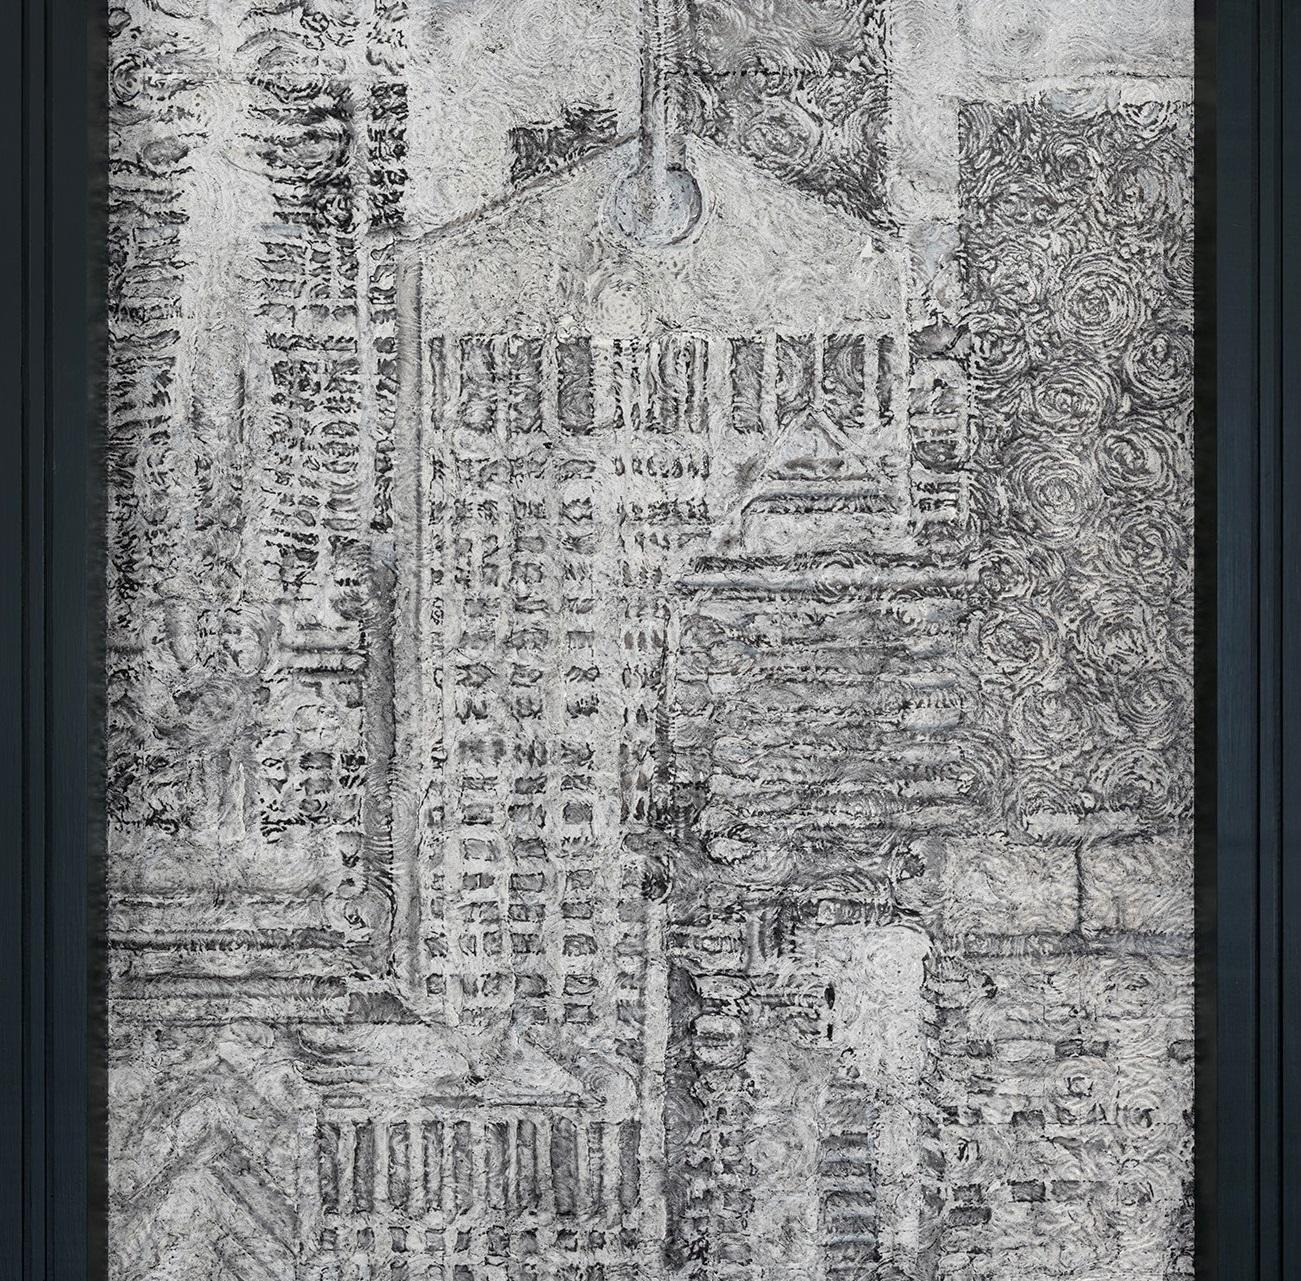 Gagosian | Richard Artschwager